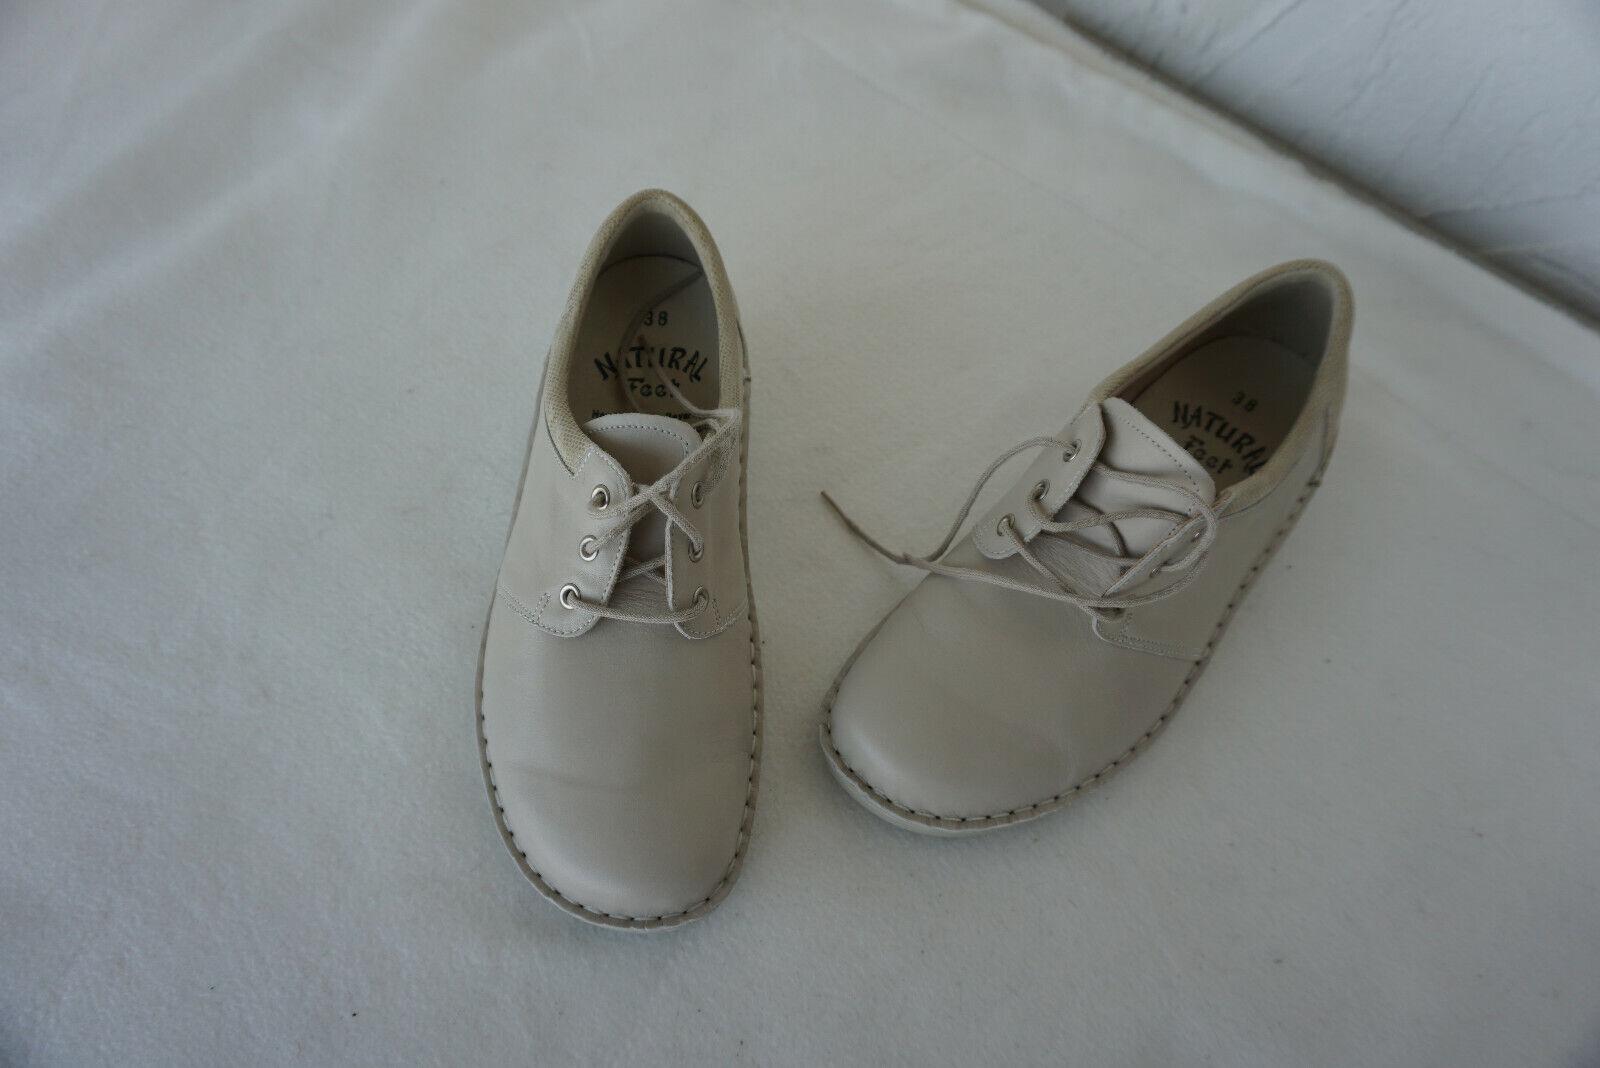 Orthopädische Natural Feet Damen Schuhe bequem Schnürschuh Gr.38 Beige Leder NEU